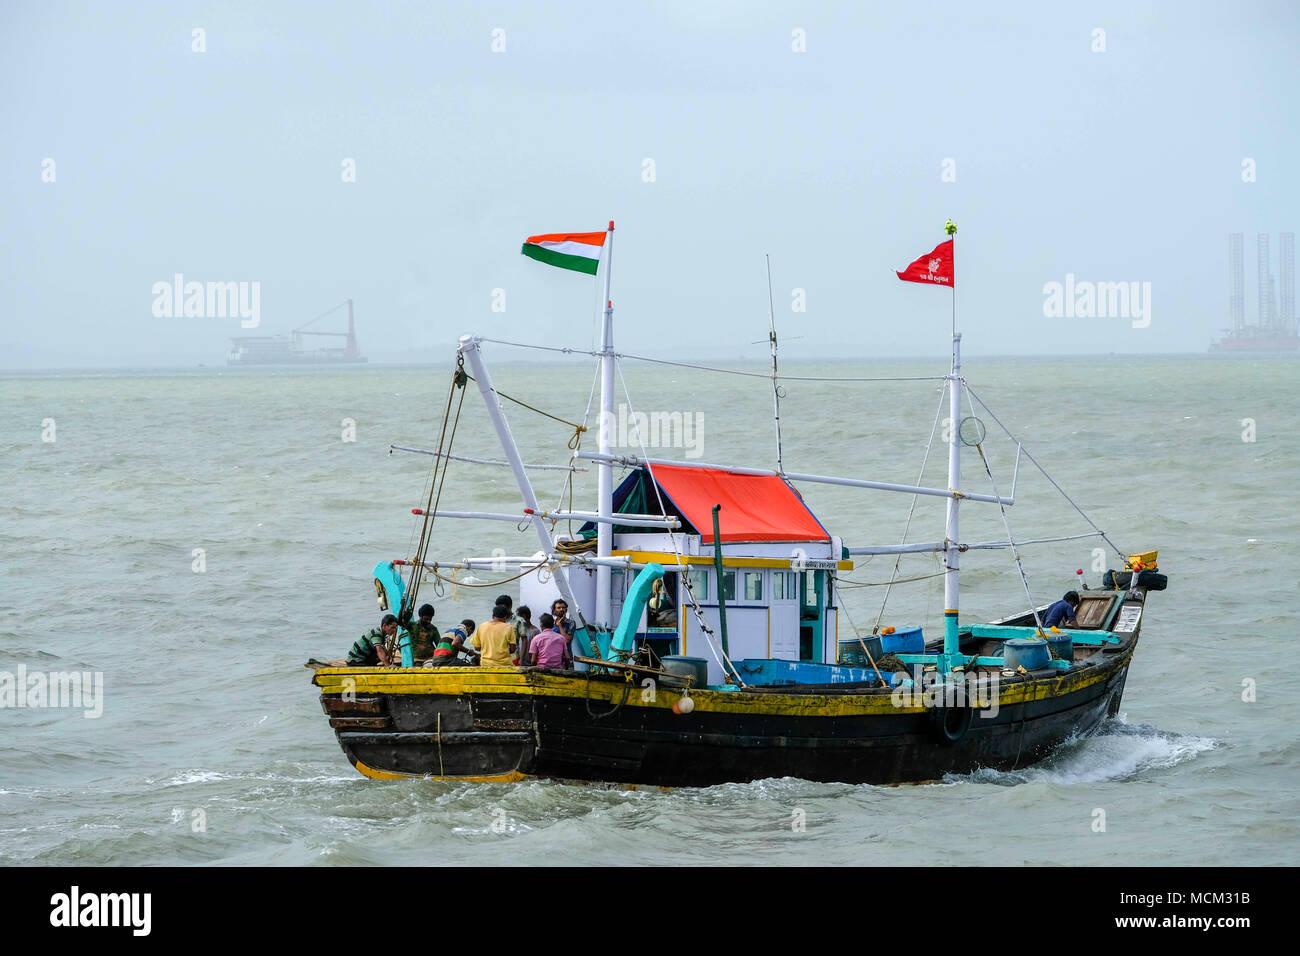 Wooden fishing vessel flying Indian flag, sailing on the Arabian sea in Mumbai, India - Stock Image